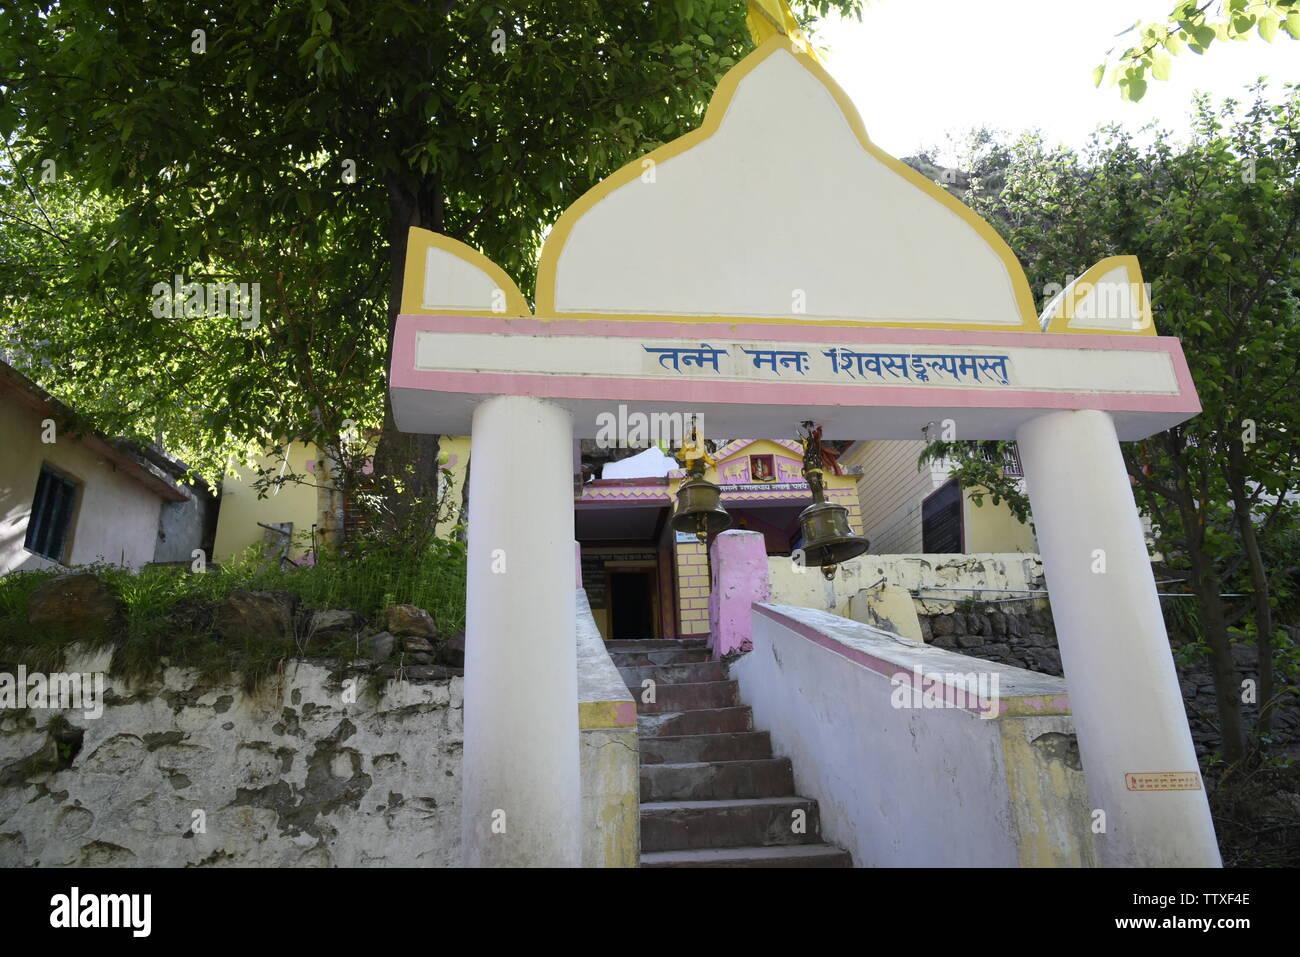 Ganesh o Gufa Cueva en India la última aldea aldea de maná 2019 cerca de Chamoli, Rudrapryag Badrniath ,, India, Asia Foto de stock